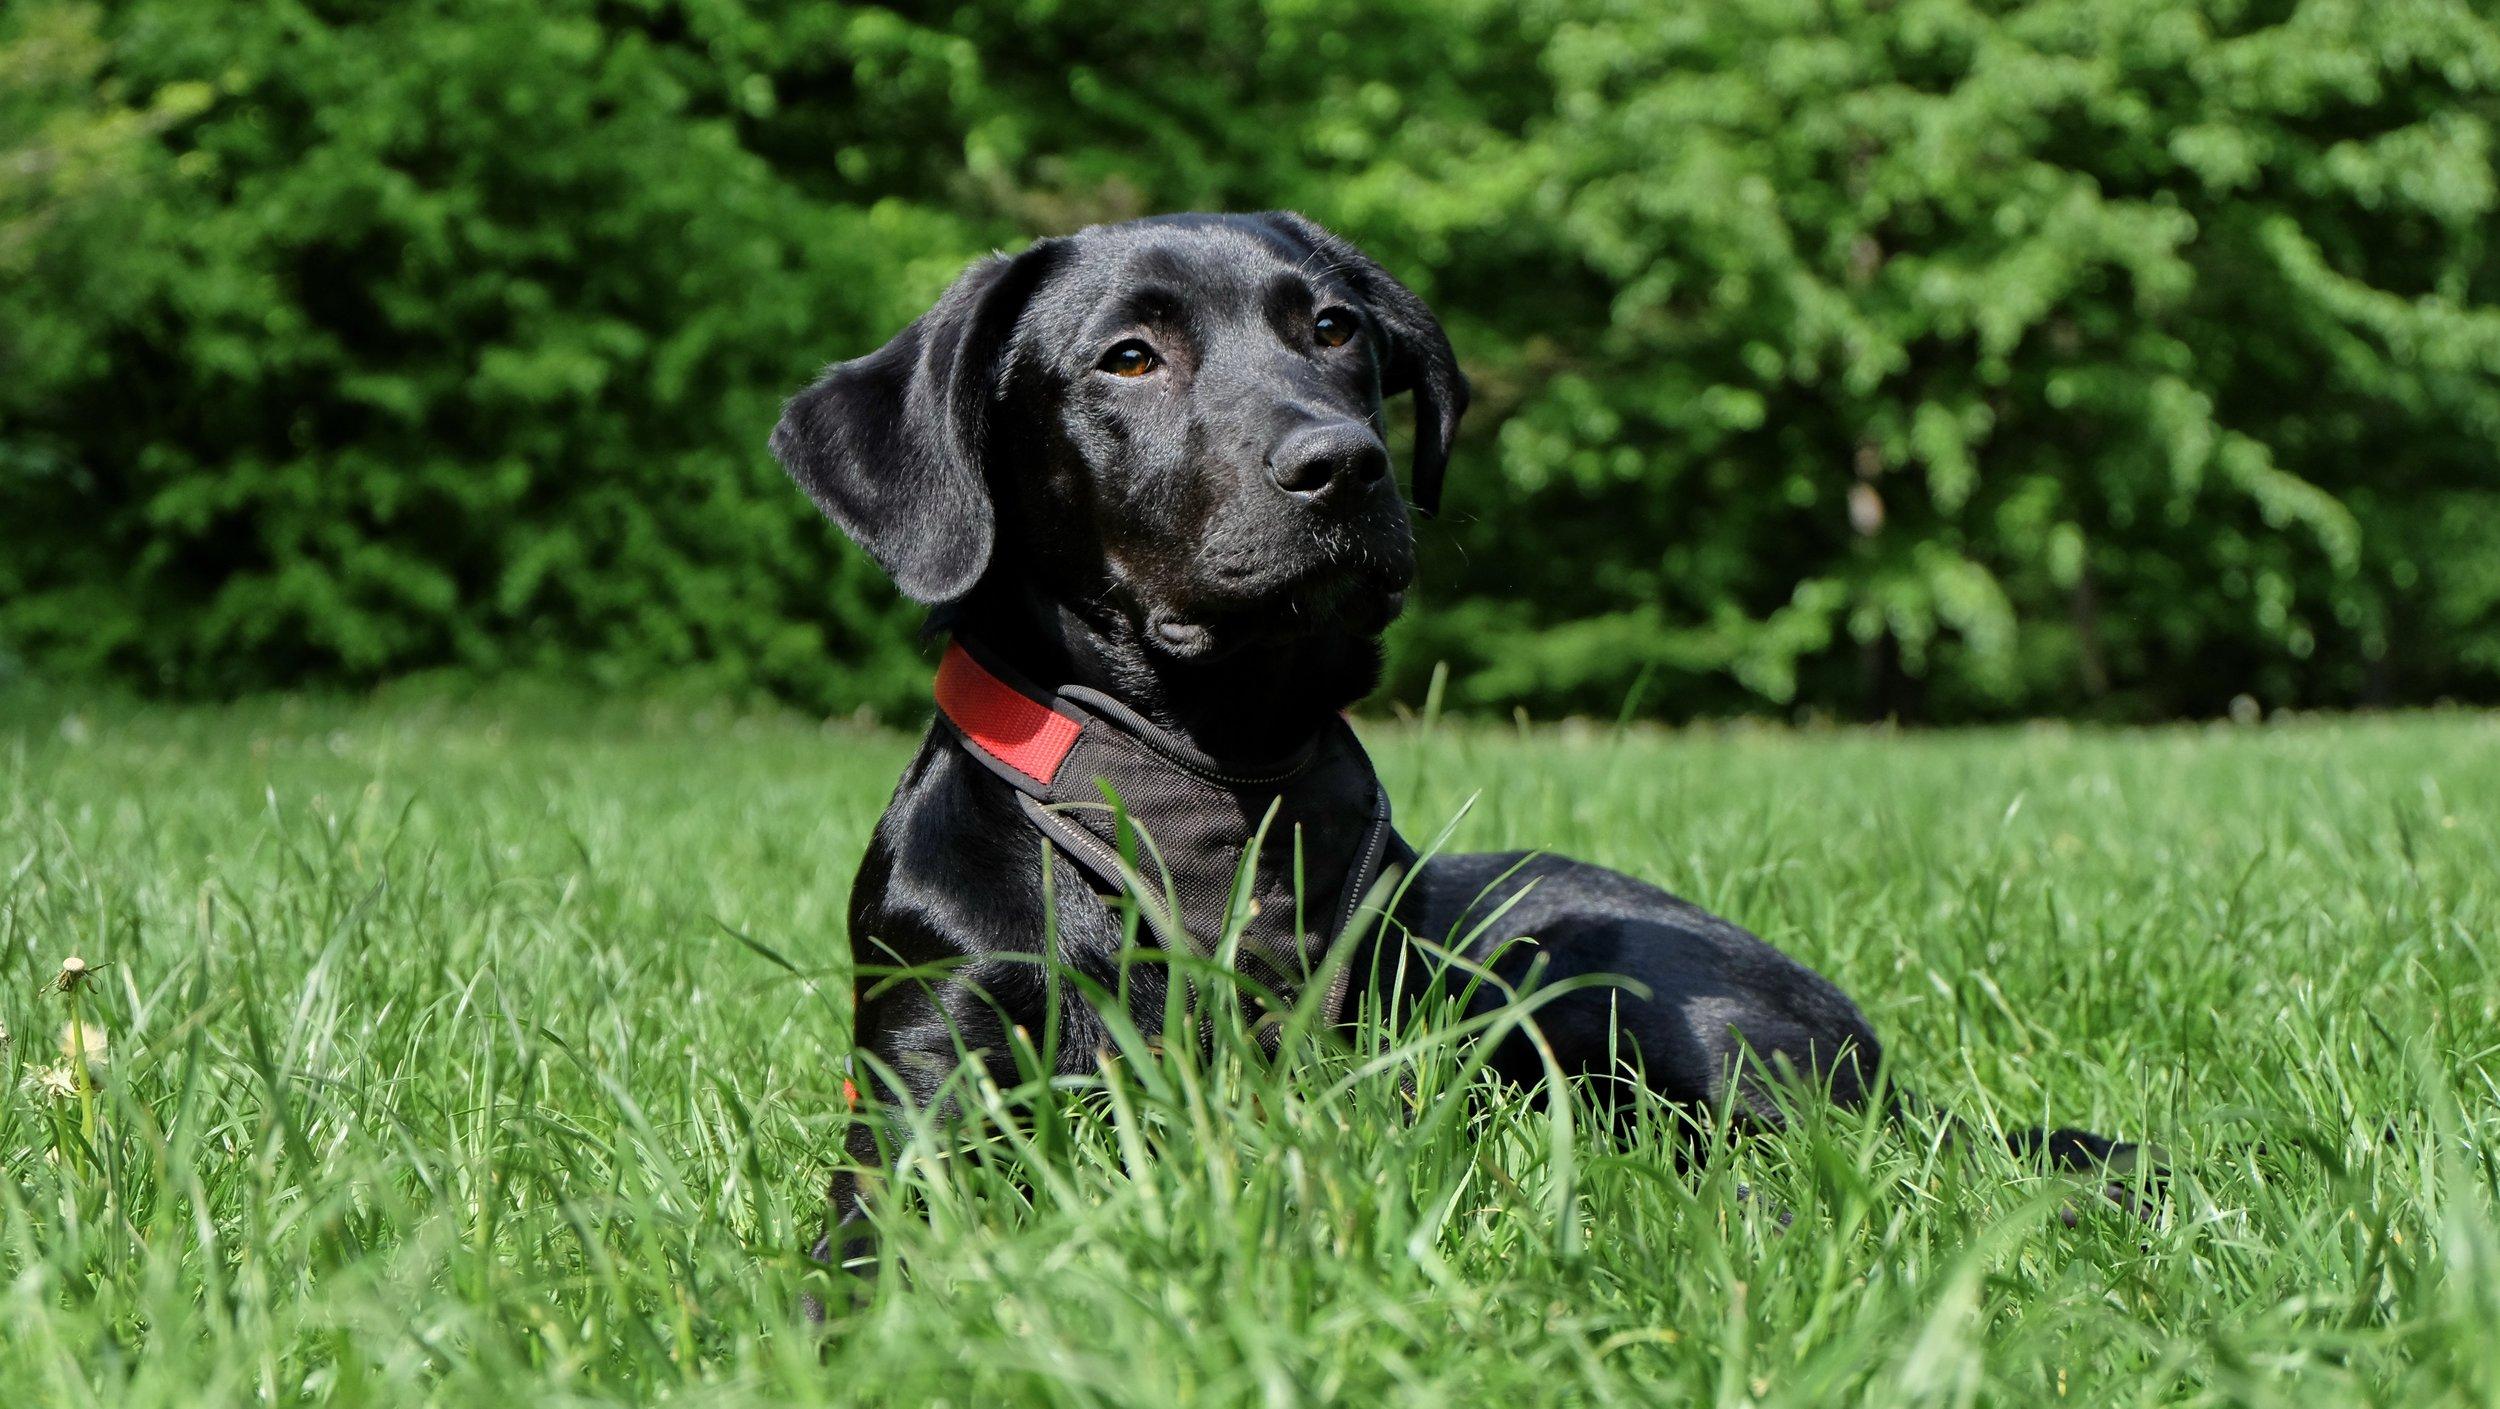 dog-black-labrador-black-dog-162149.jpeg